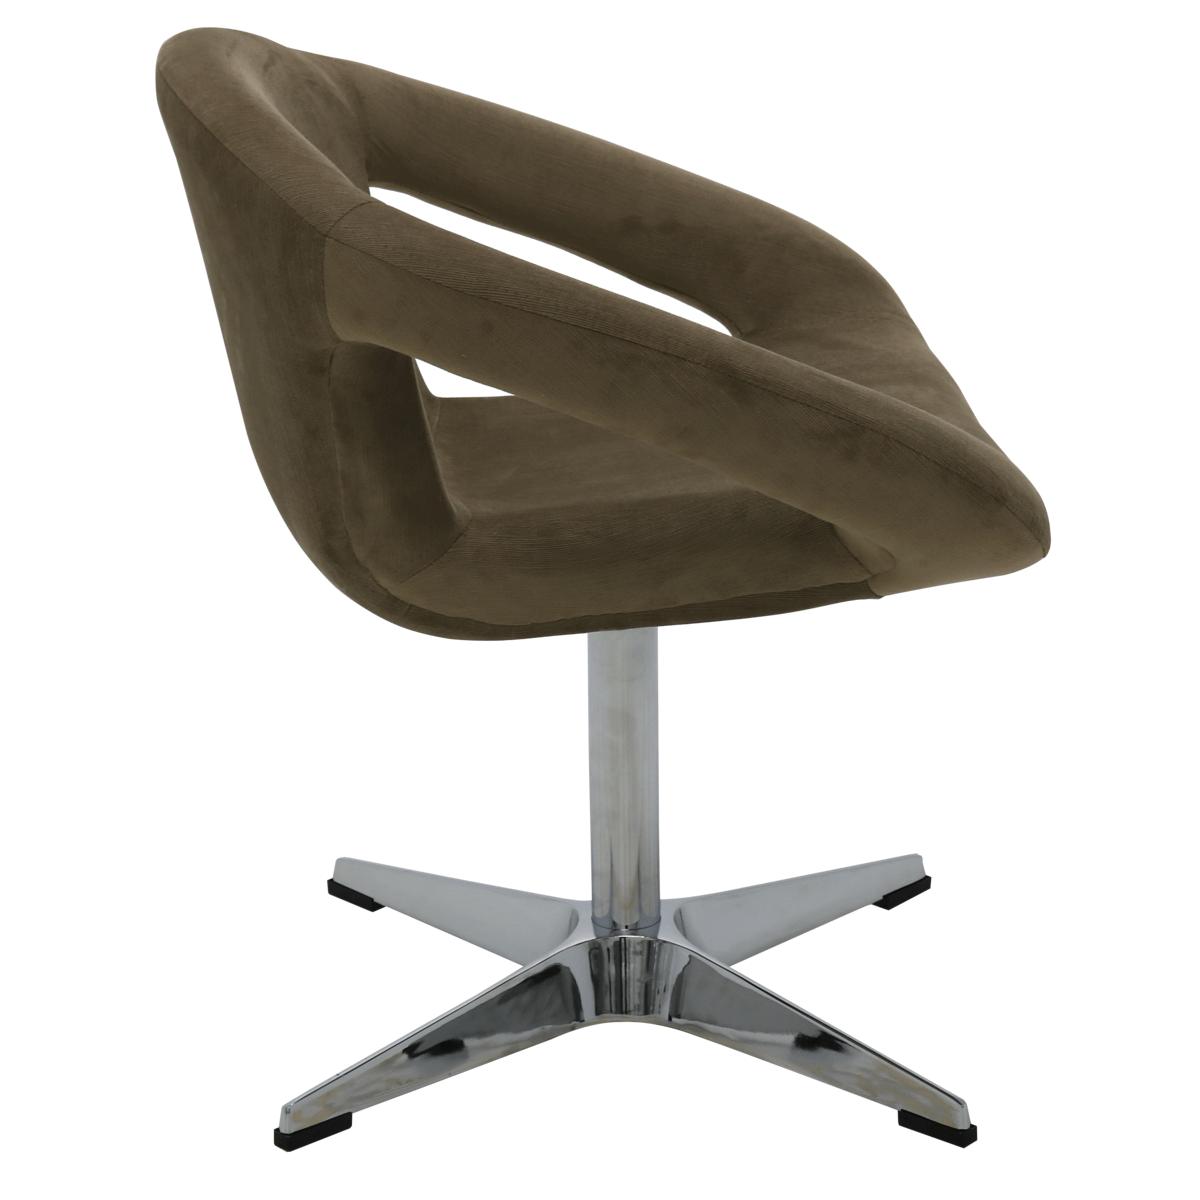 Cadeira Tramontina Delice Estofada Moca em Polietileno com Base X 92705213